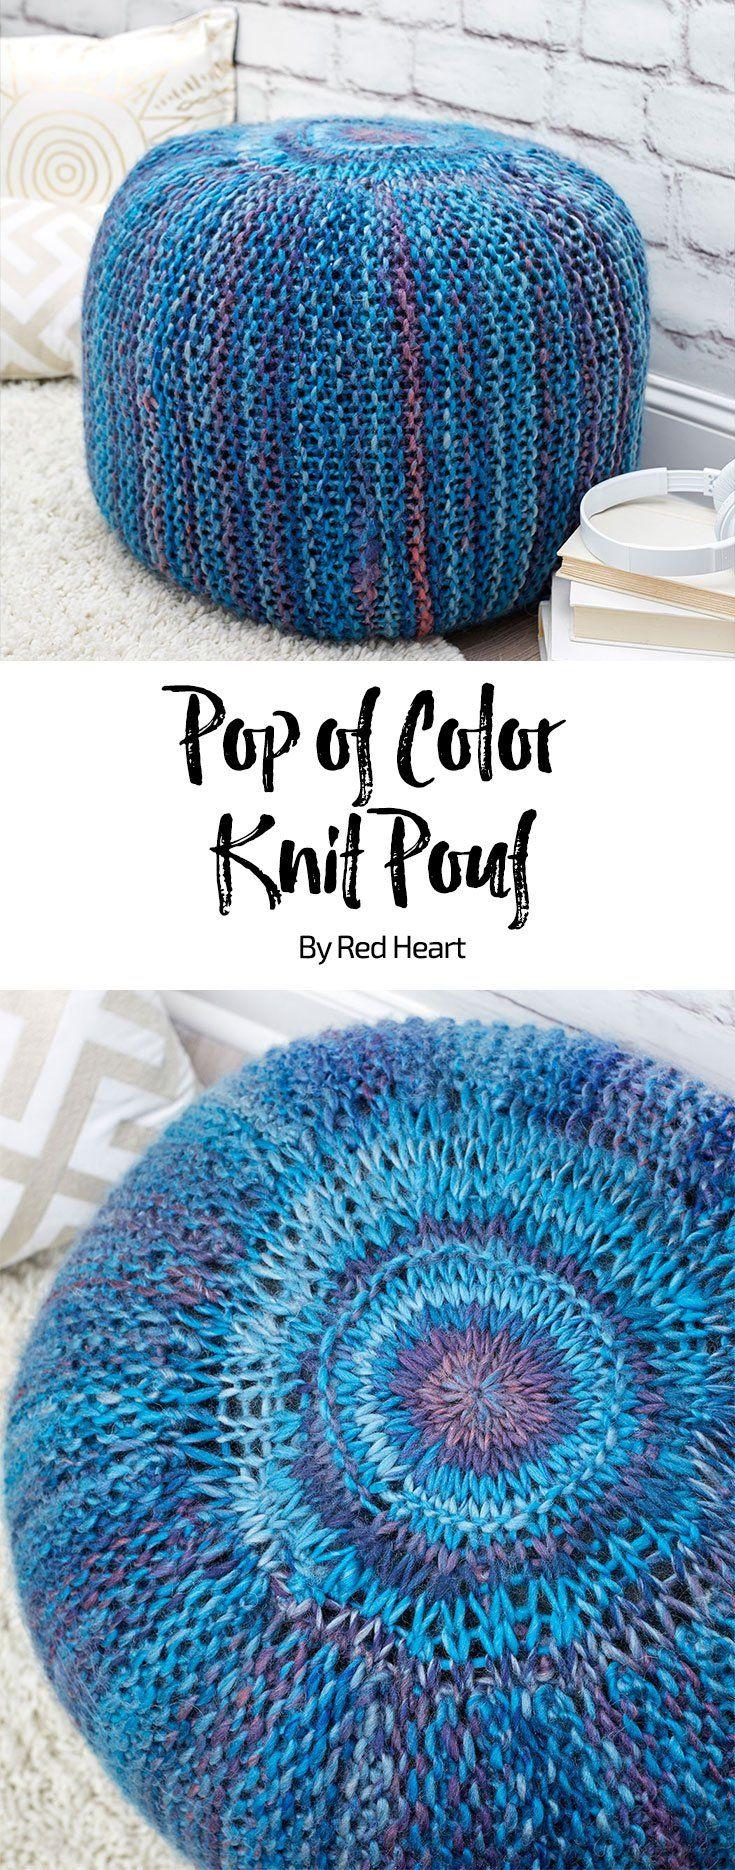 Pop of Color Knit Pouf free knit pattern in Evermore yarn. | Crochet ...